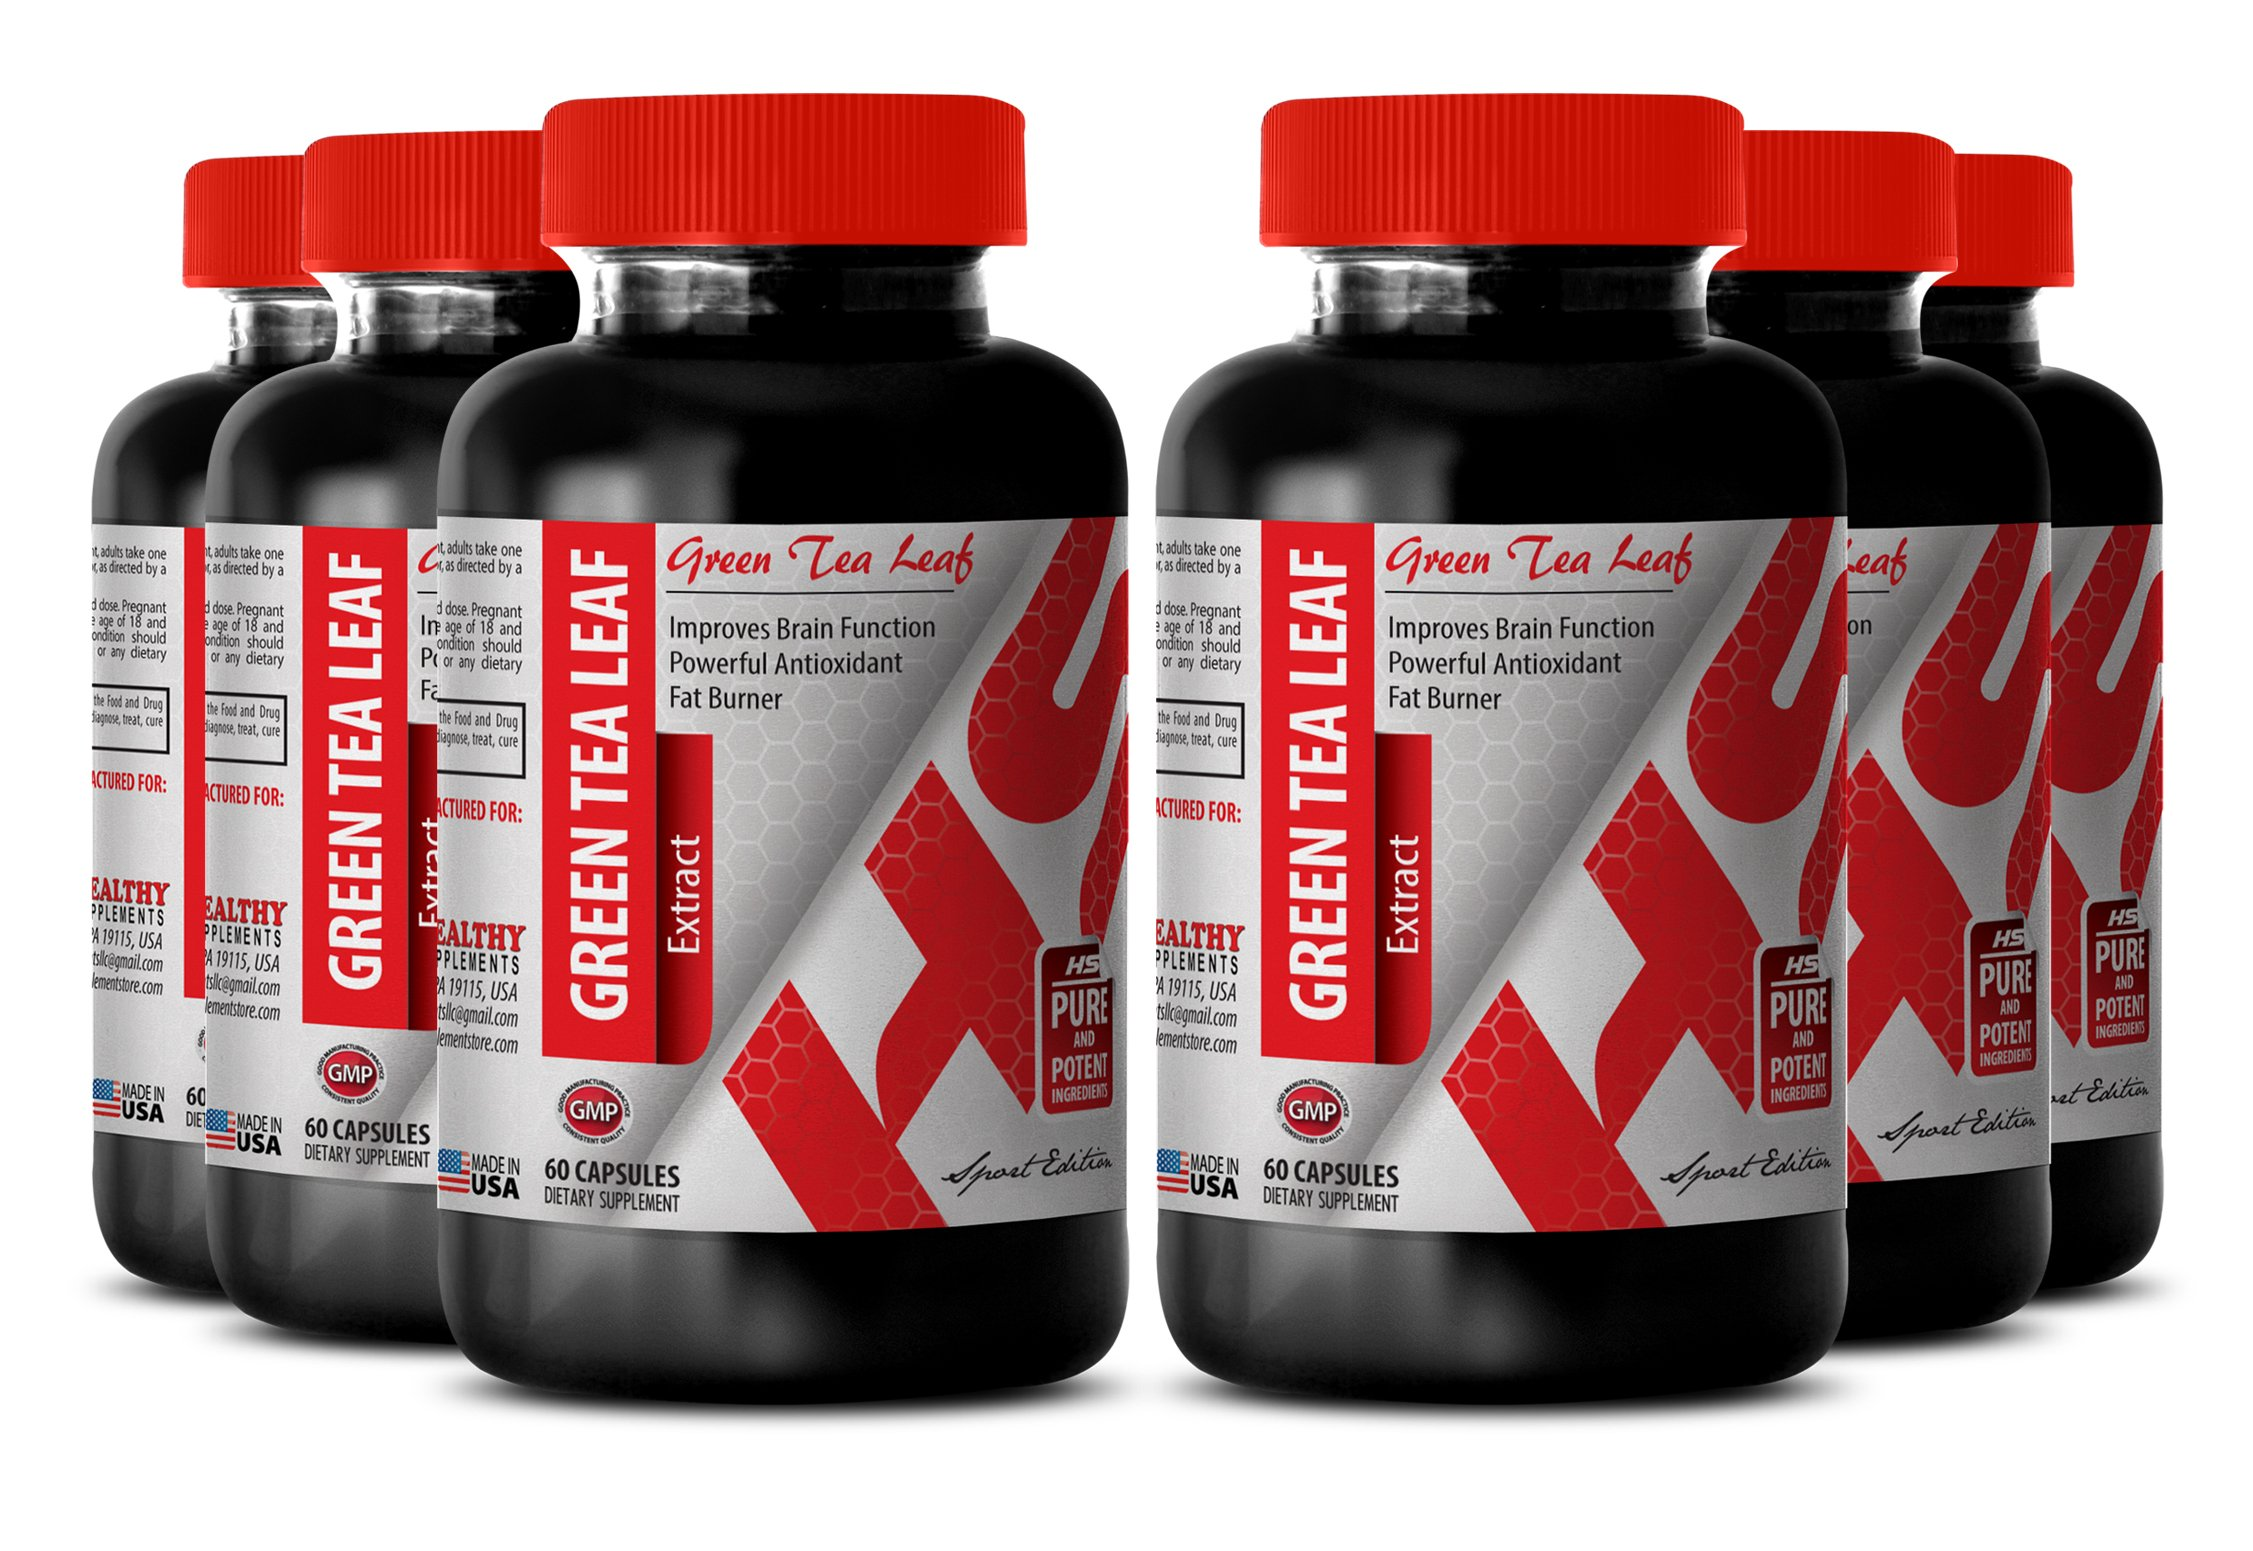 Green tea organic pills - 300 MG GREEN TEA LEAF EXTRACT - for weight loss process (6 Bottles)